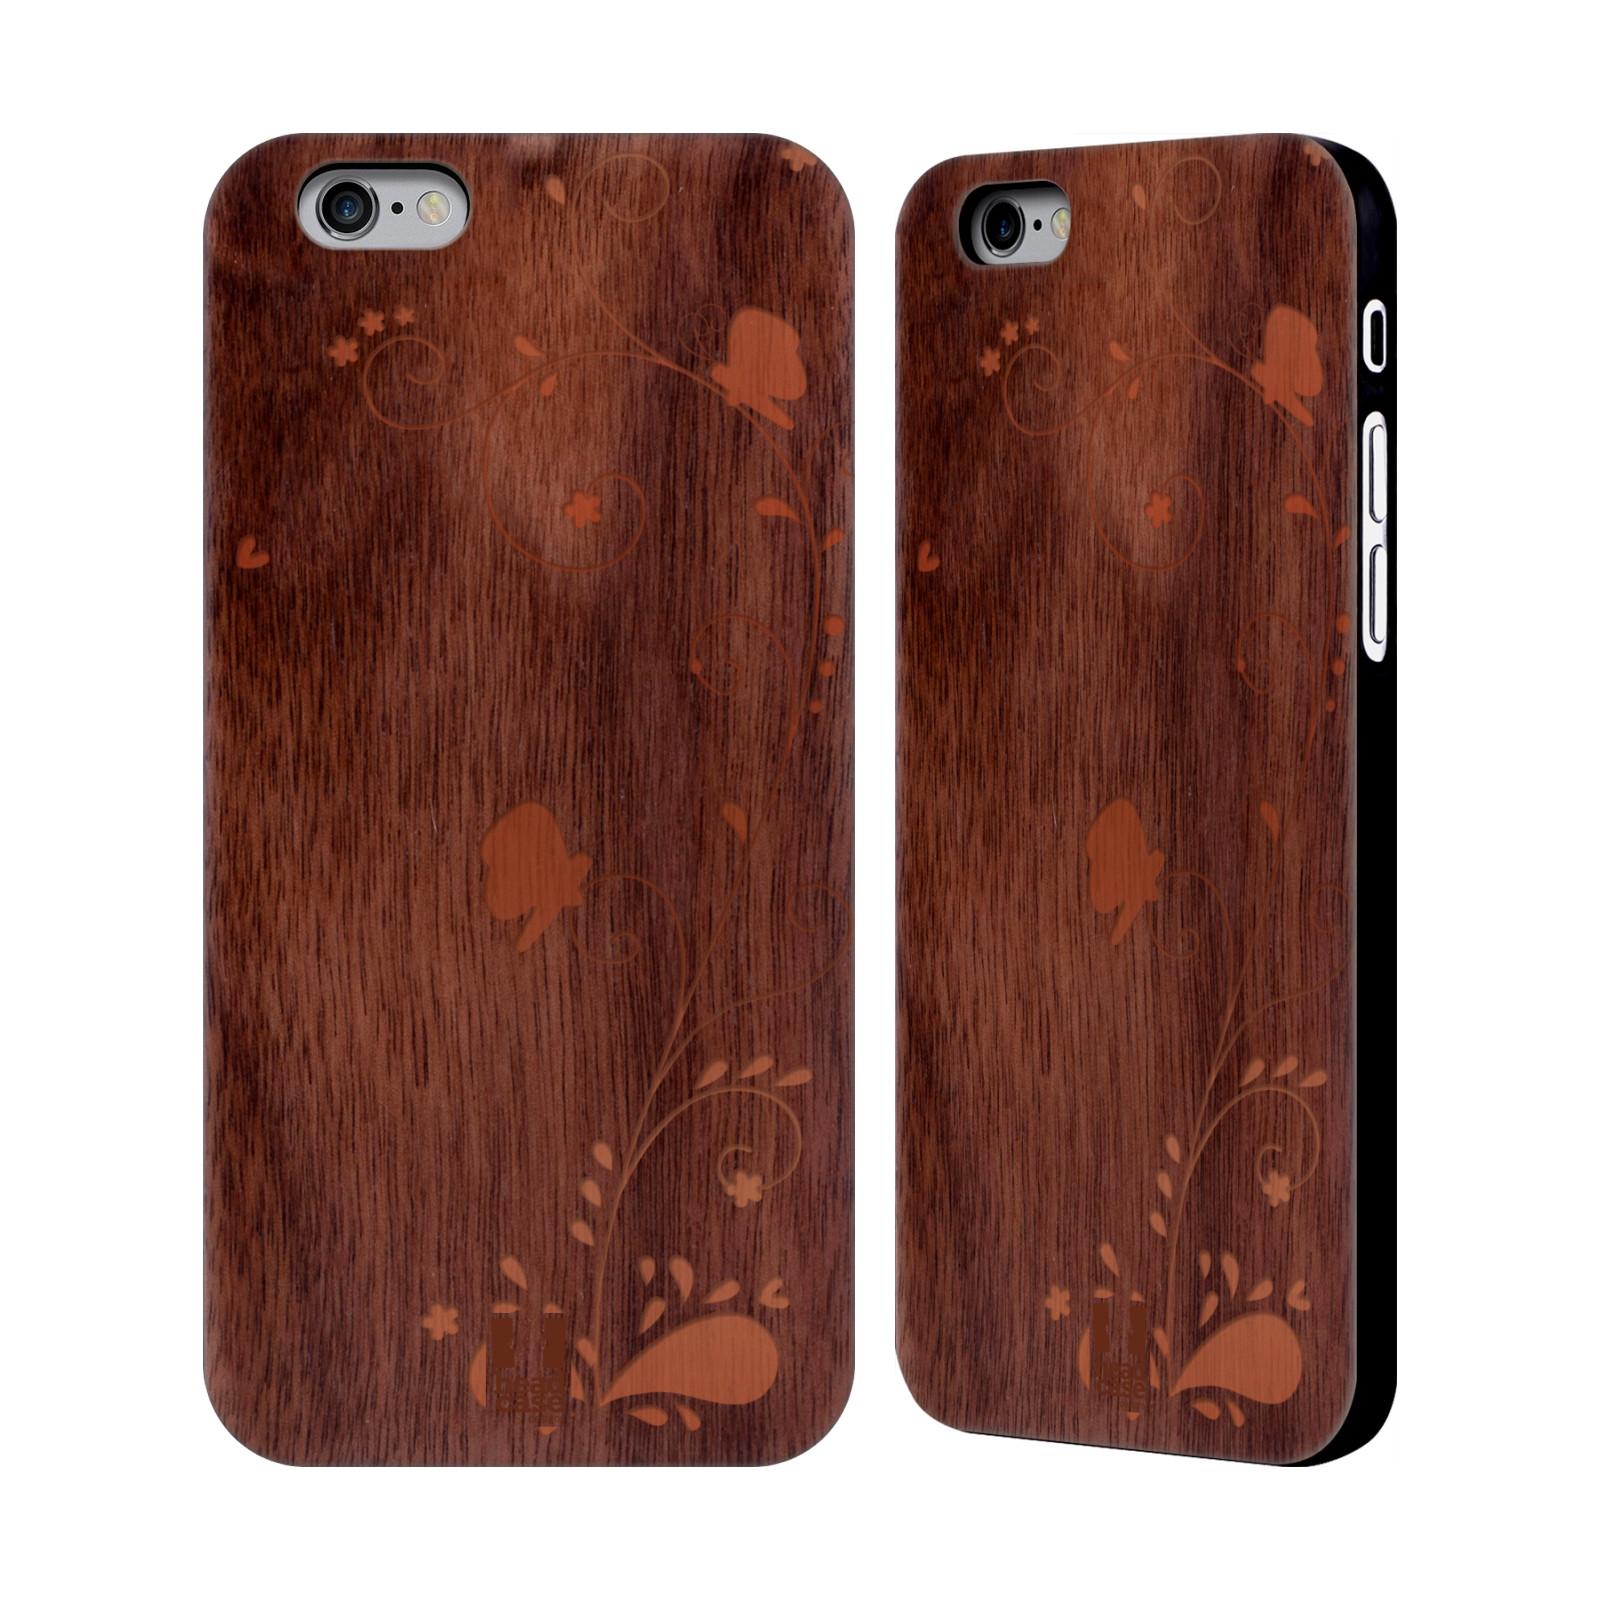 Head case designs wood art walnut wooden back case cover for Case design